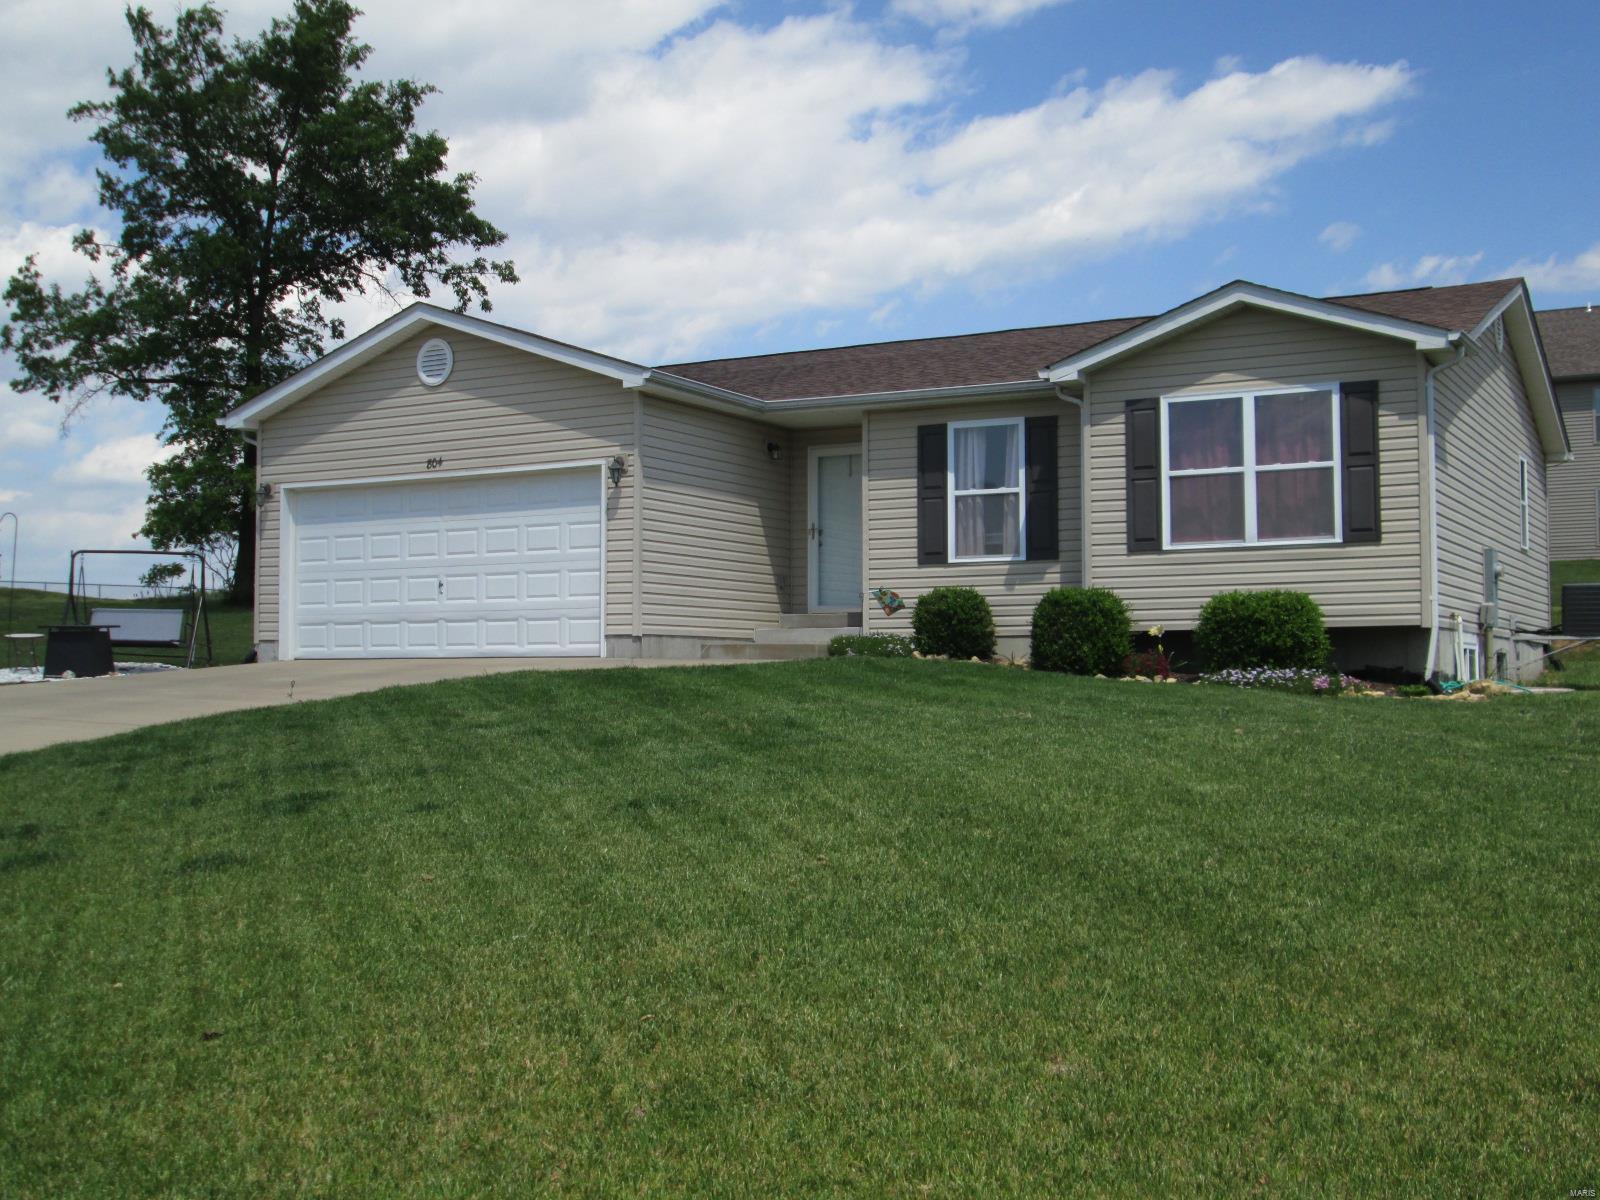 804 Ella Lane Property Photo - St Clair, MO real estate listing